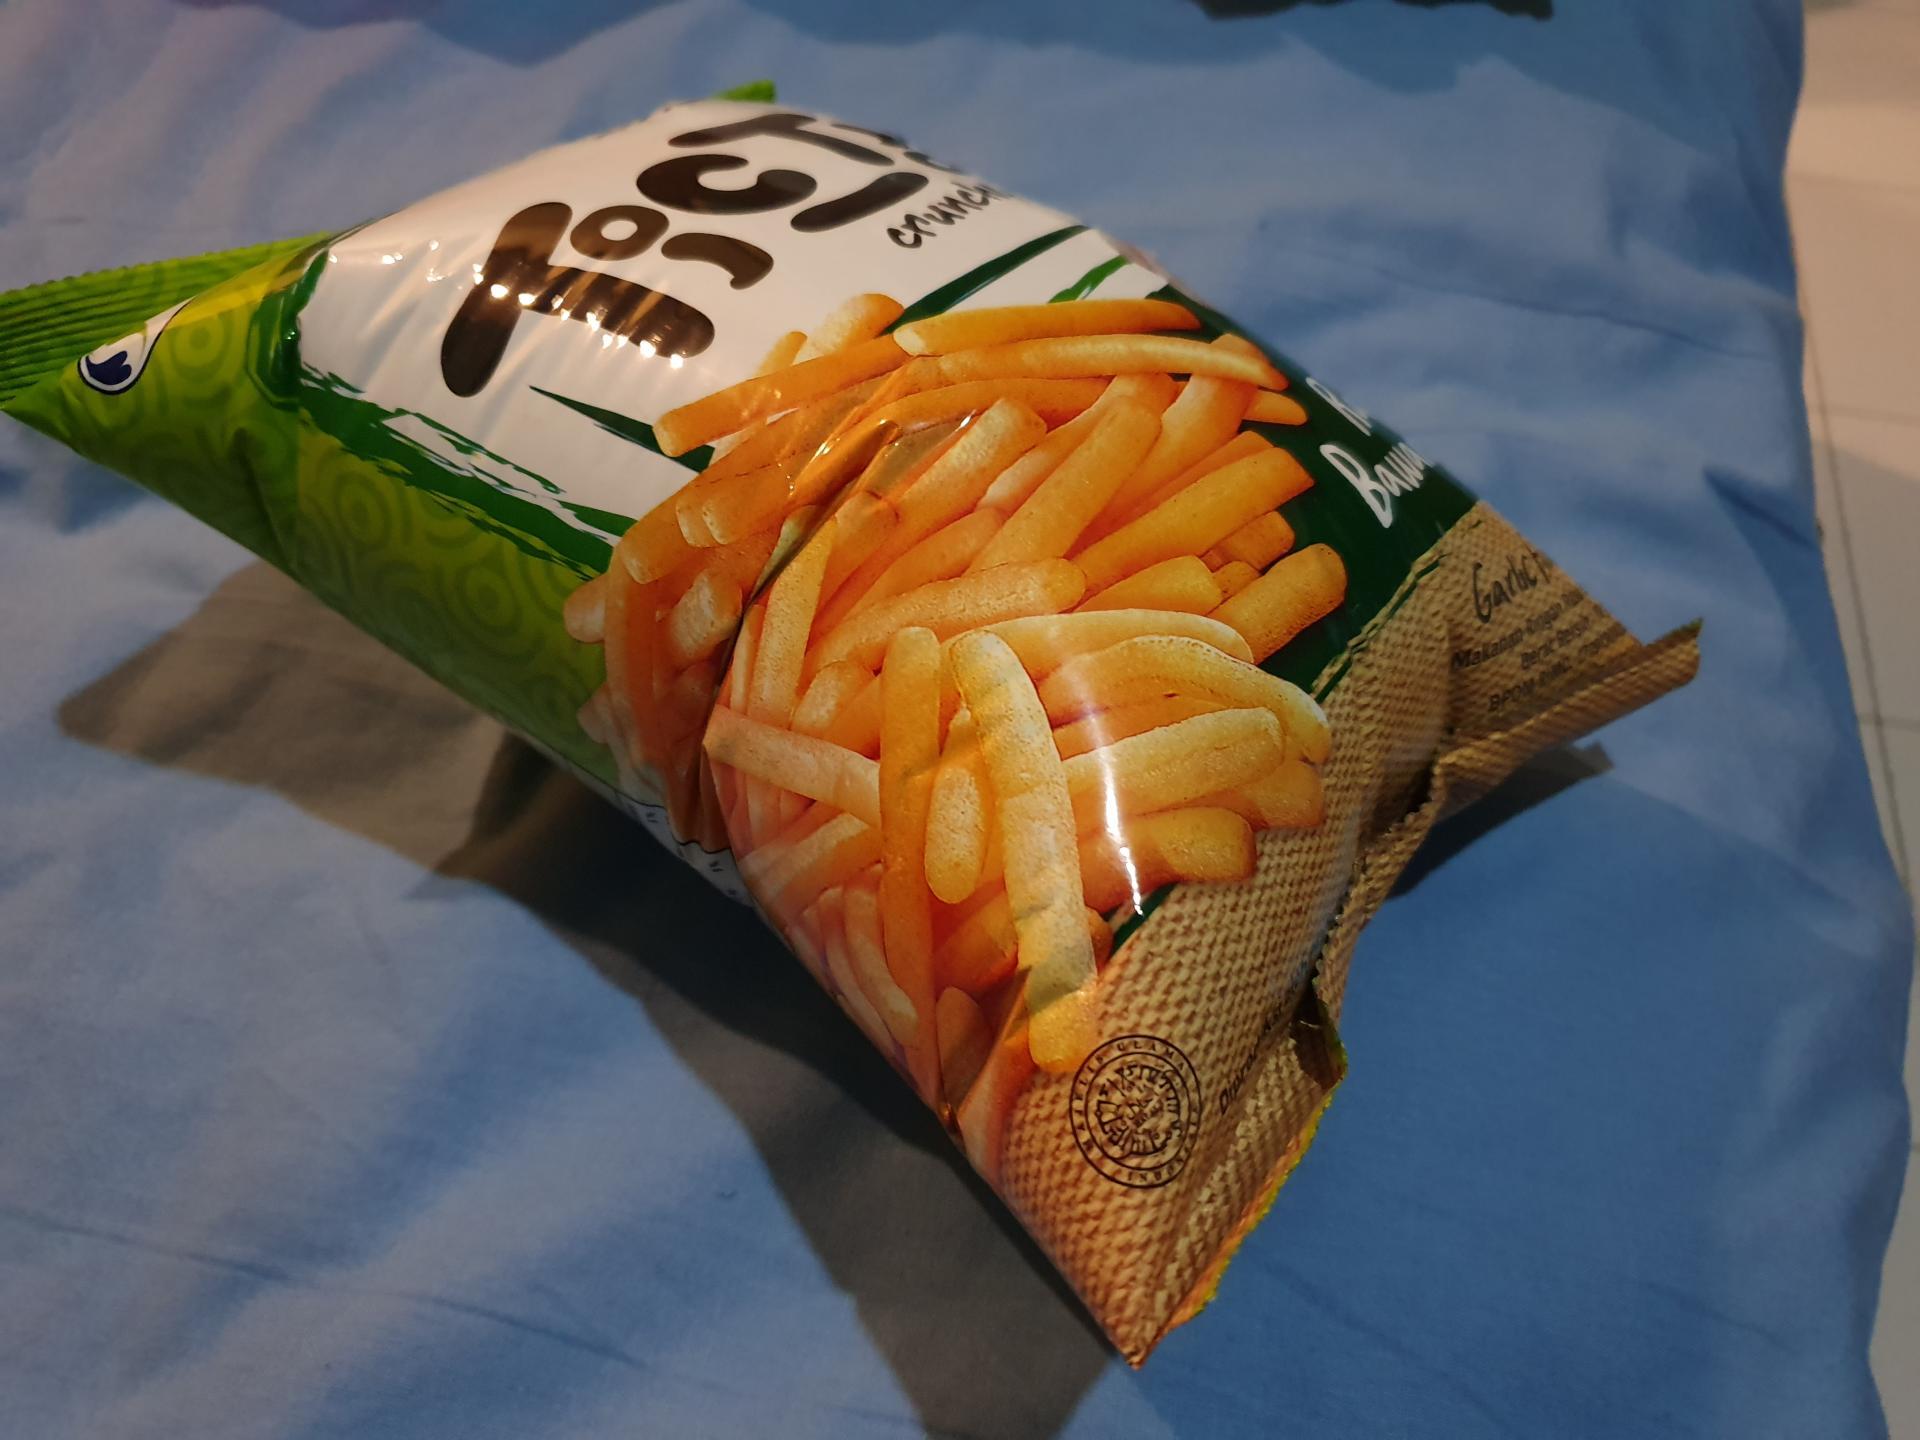 пакет с чипсами раздулся в горах